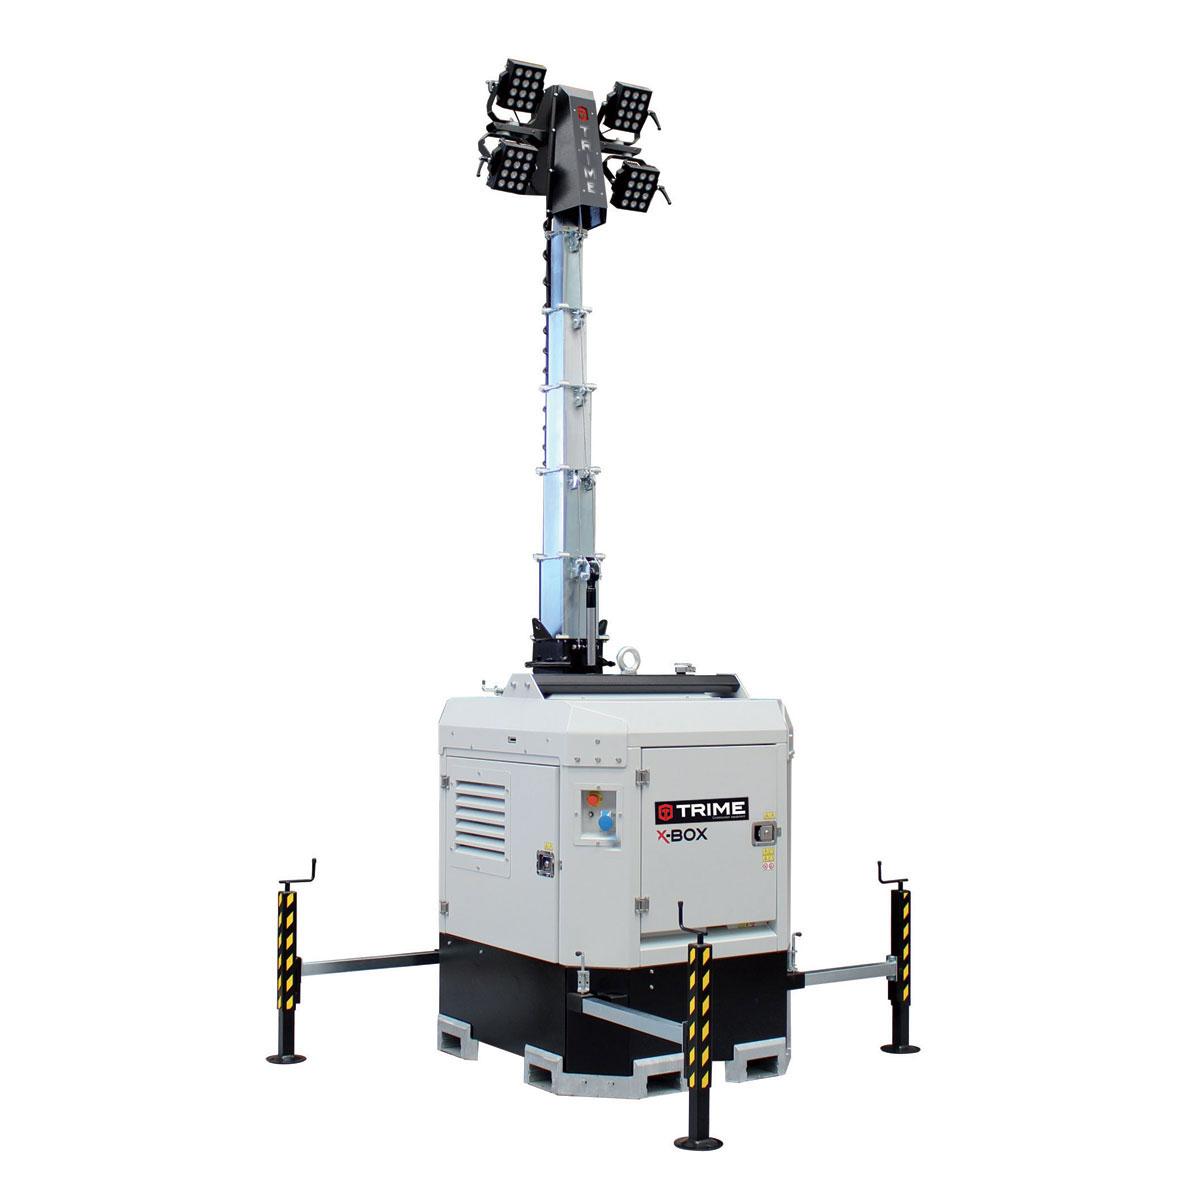 belysningsmast-led-x-box-4x150W-48V